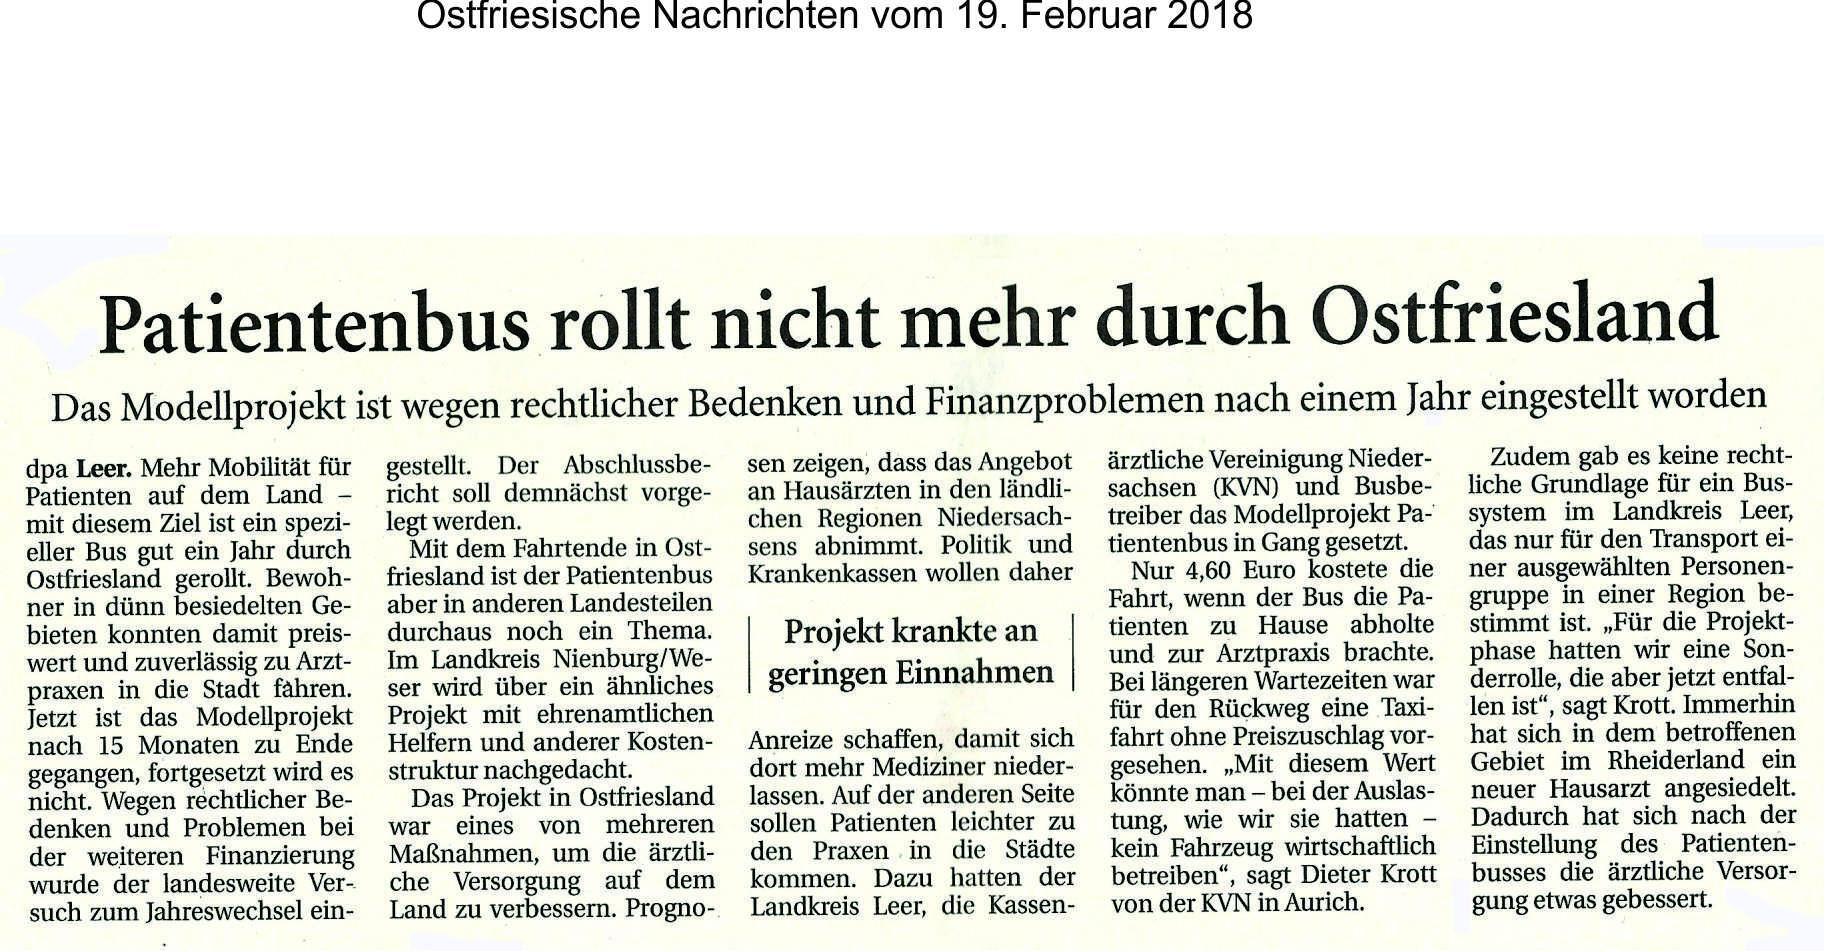 180219-ON-Patientenmobil_rollt_nicht.jpg